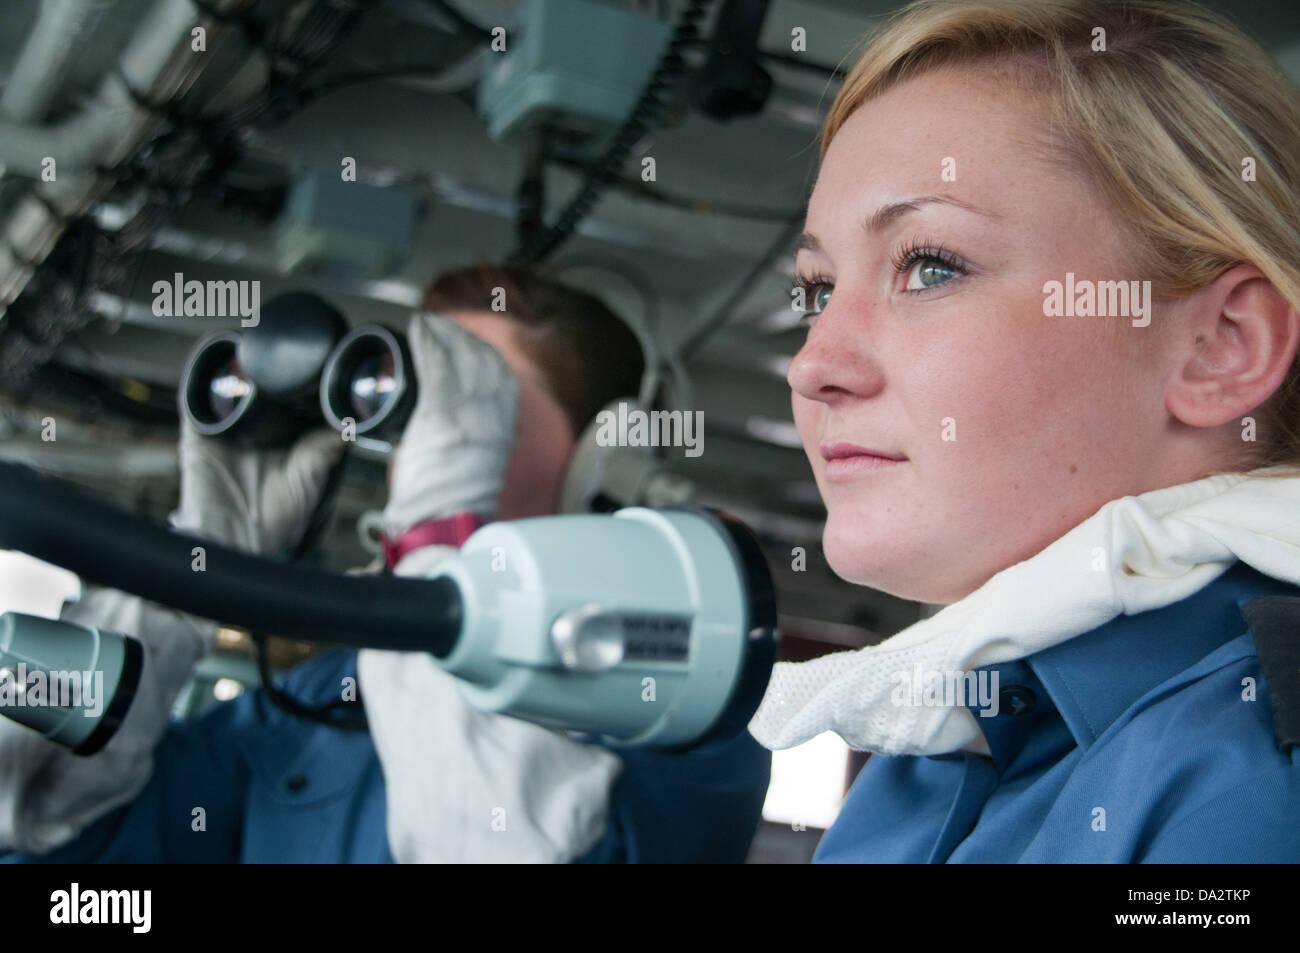 HMS Edinburgh last of her kind. - Stock Image